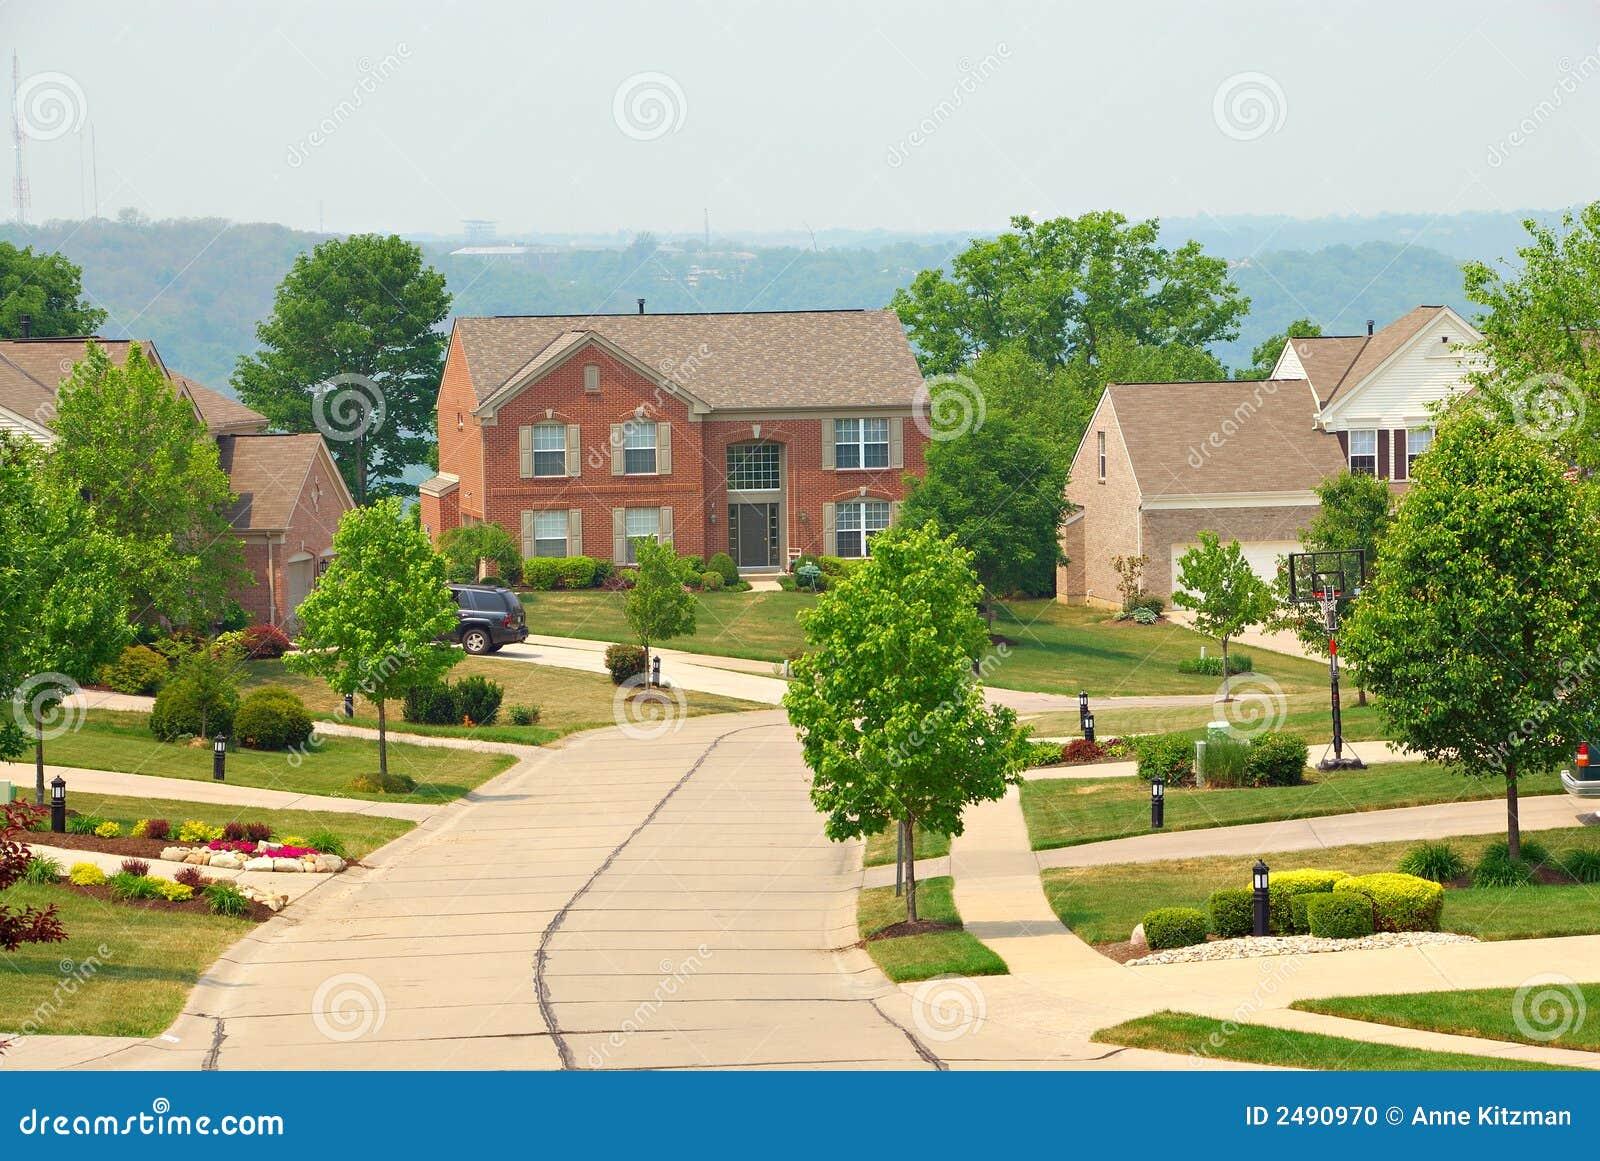 2 Story Brick Suburban Homes Stock Photo Image 2490970